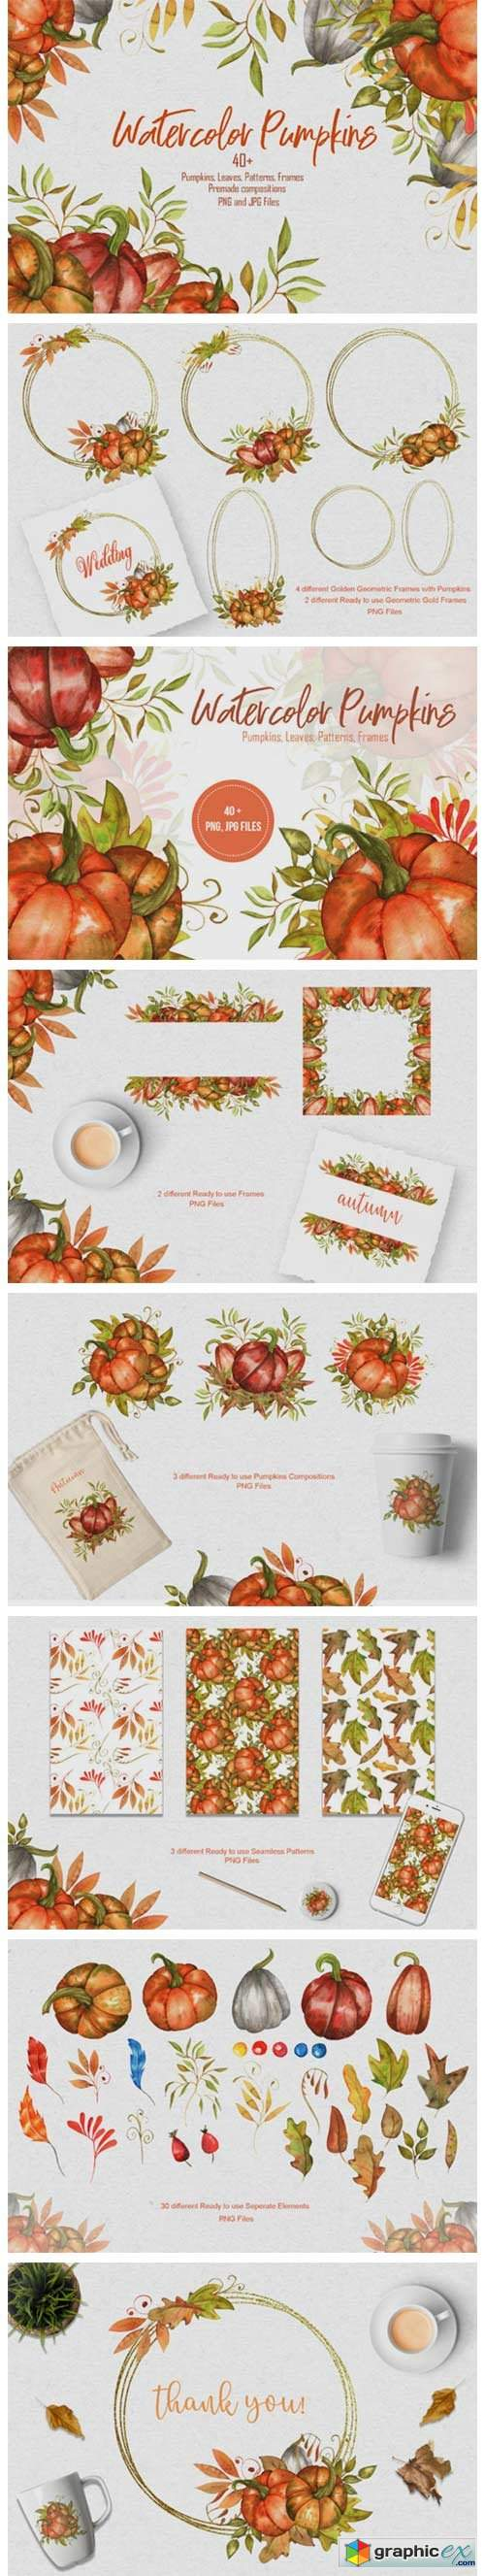 Watercolor Pumpkins Collection